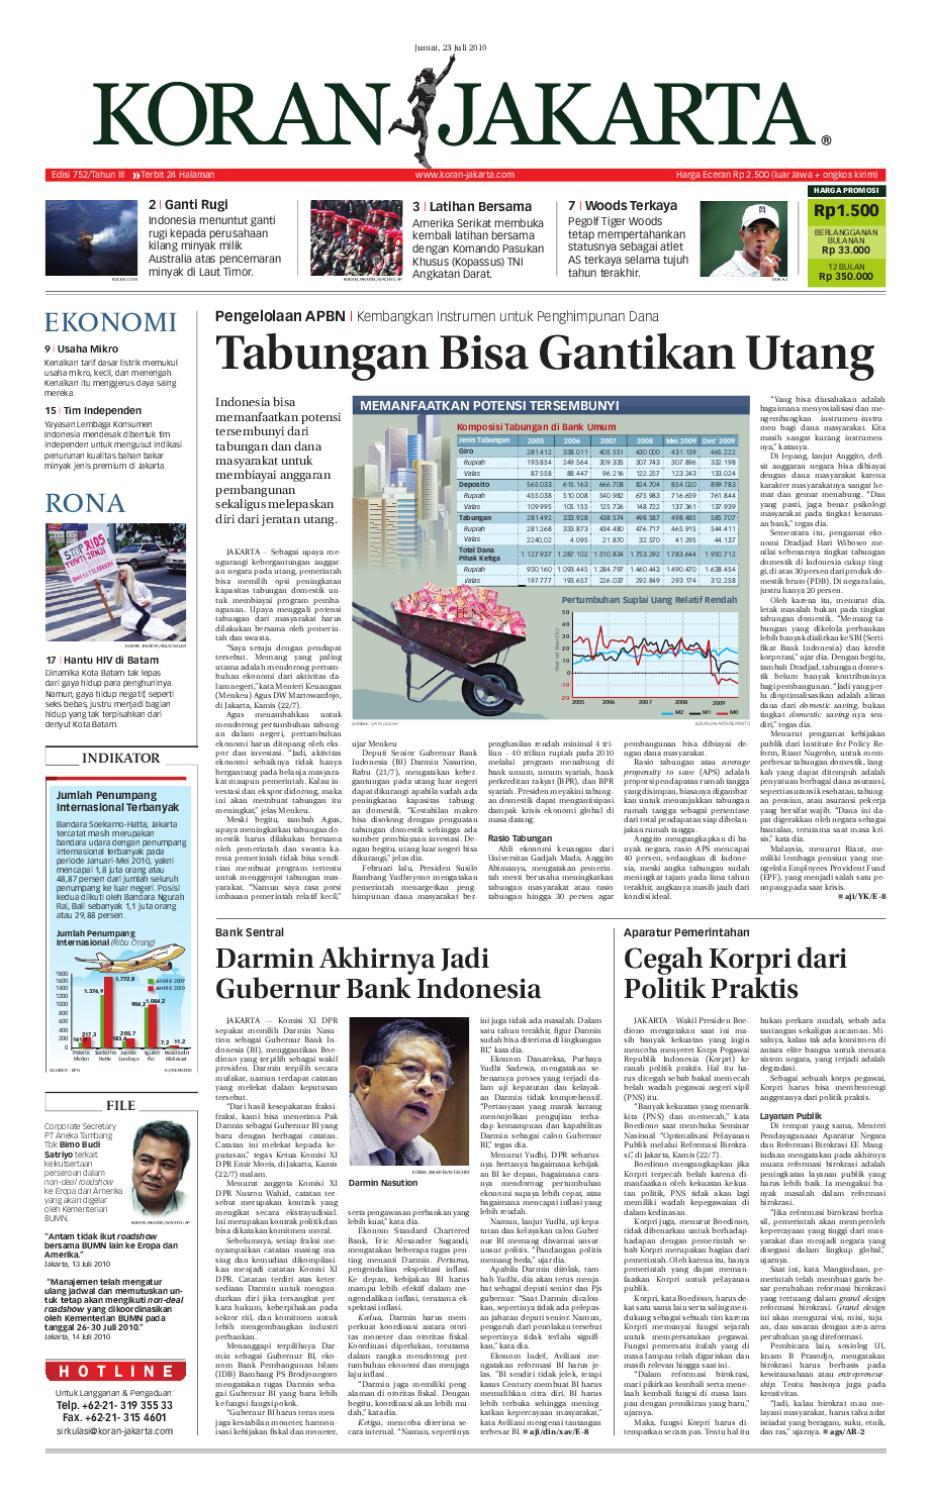 Edisi 752 23 Juli 2010 By Pt Berita Nusantara Issuu Produk Ukm Bumn Ring Berlian Eropa